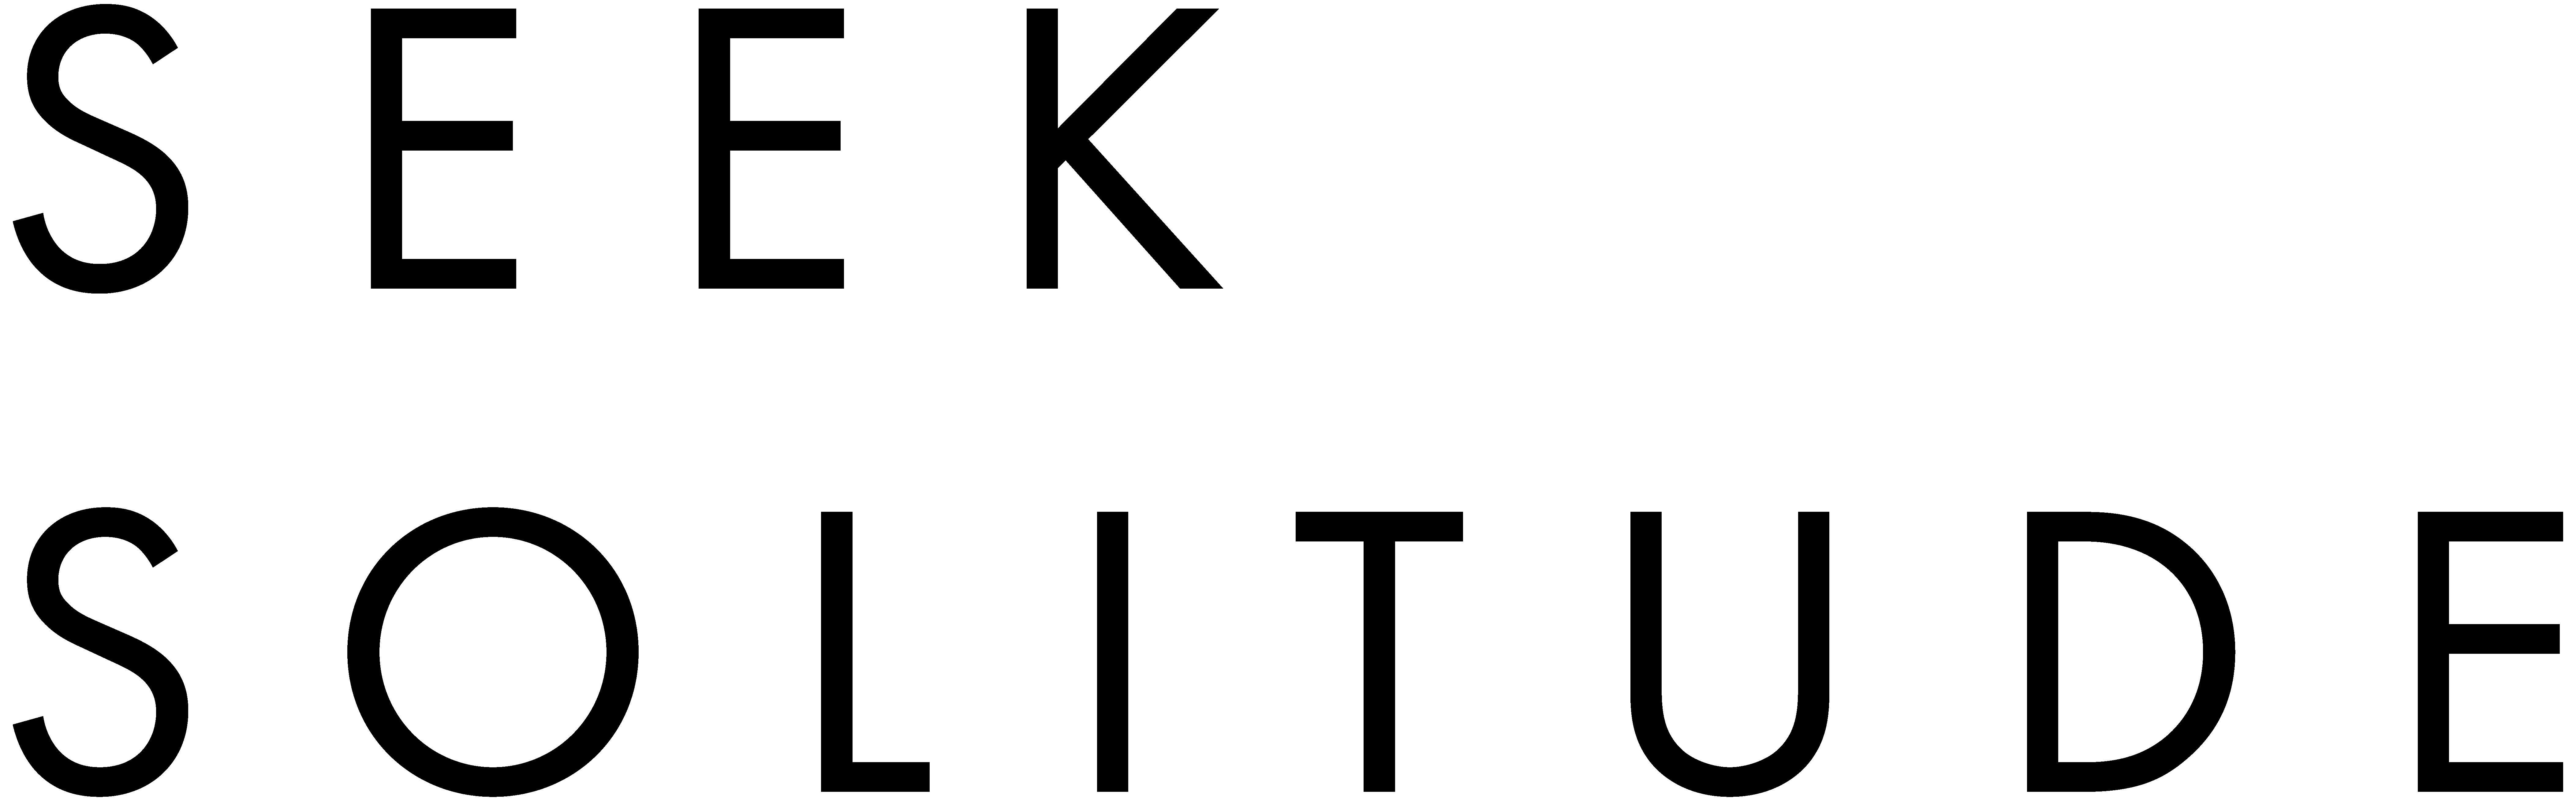 Seek Solitude logo